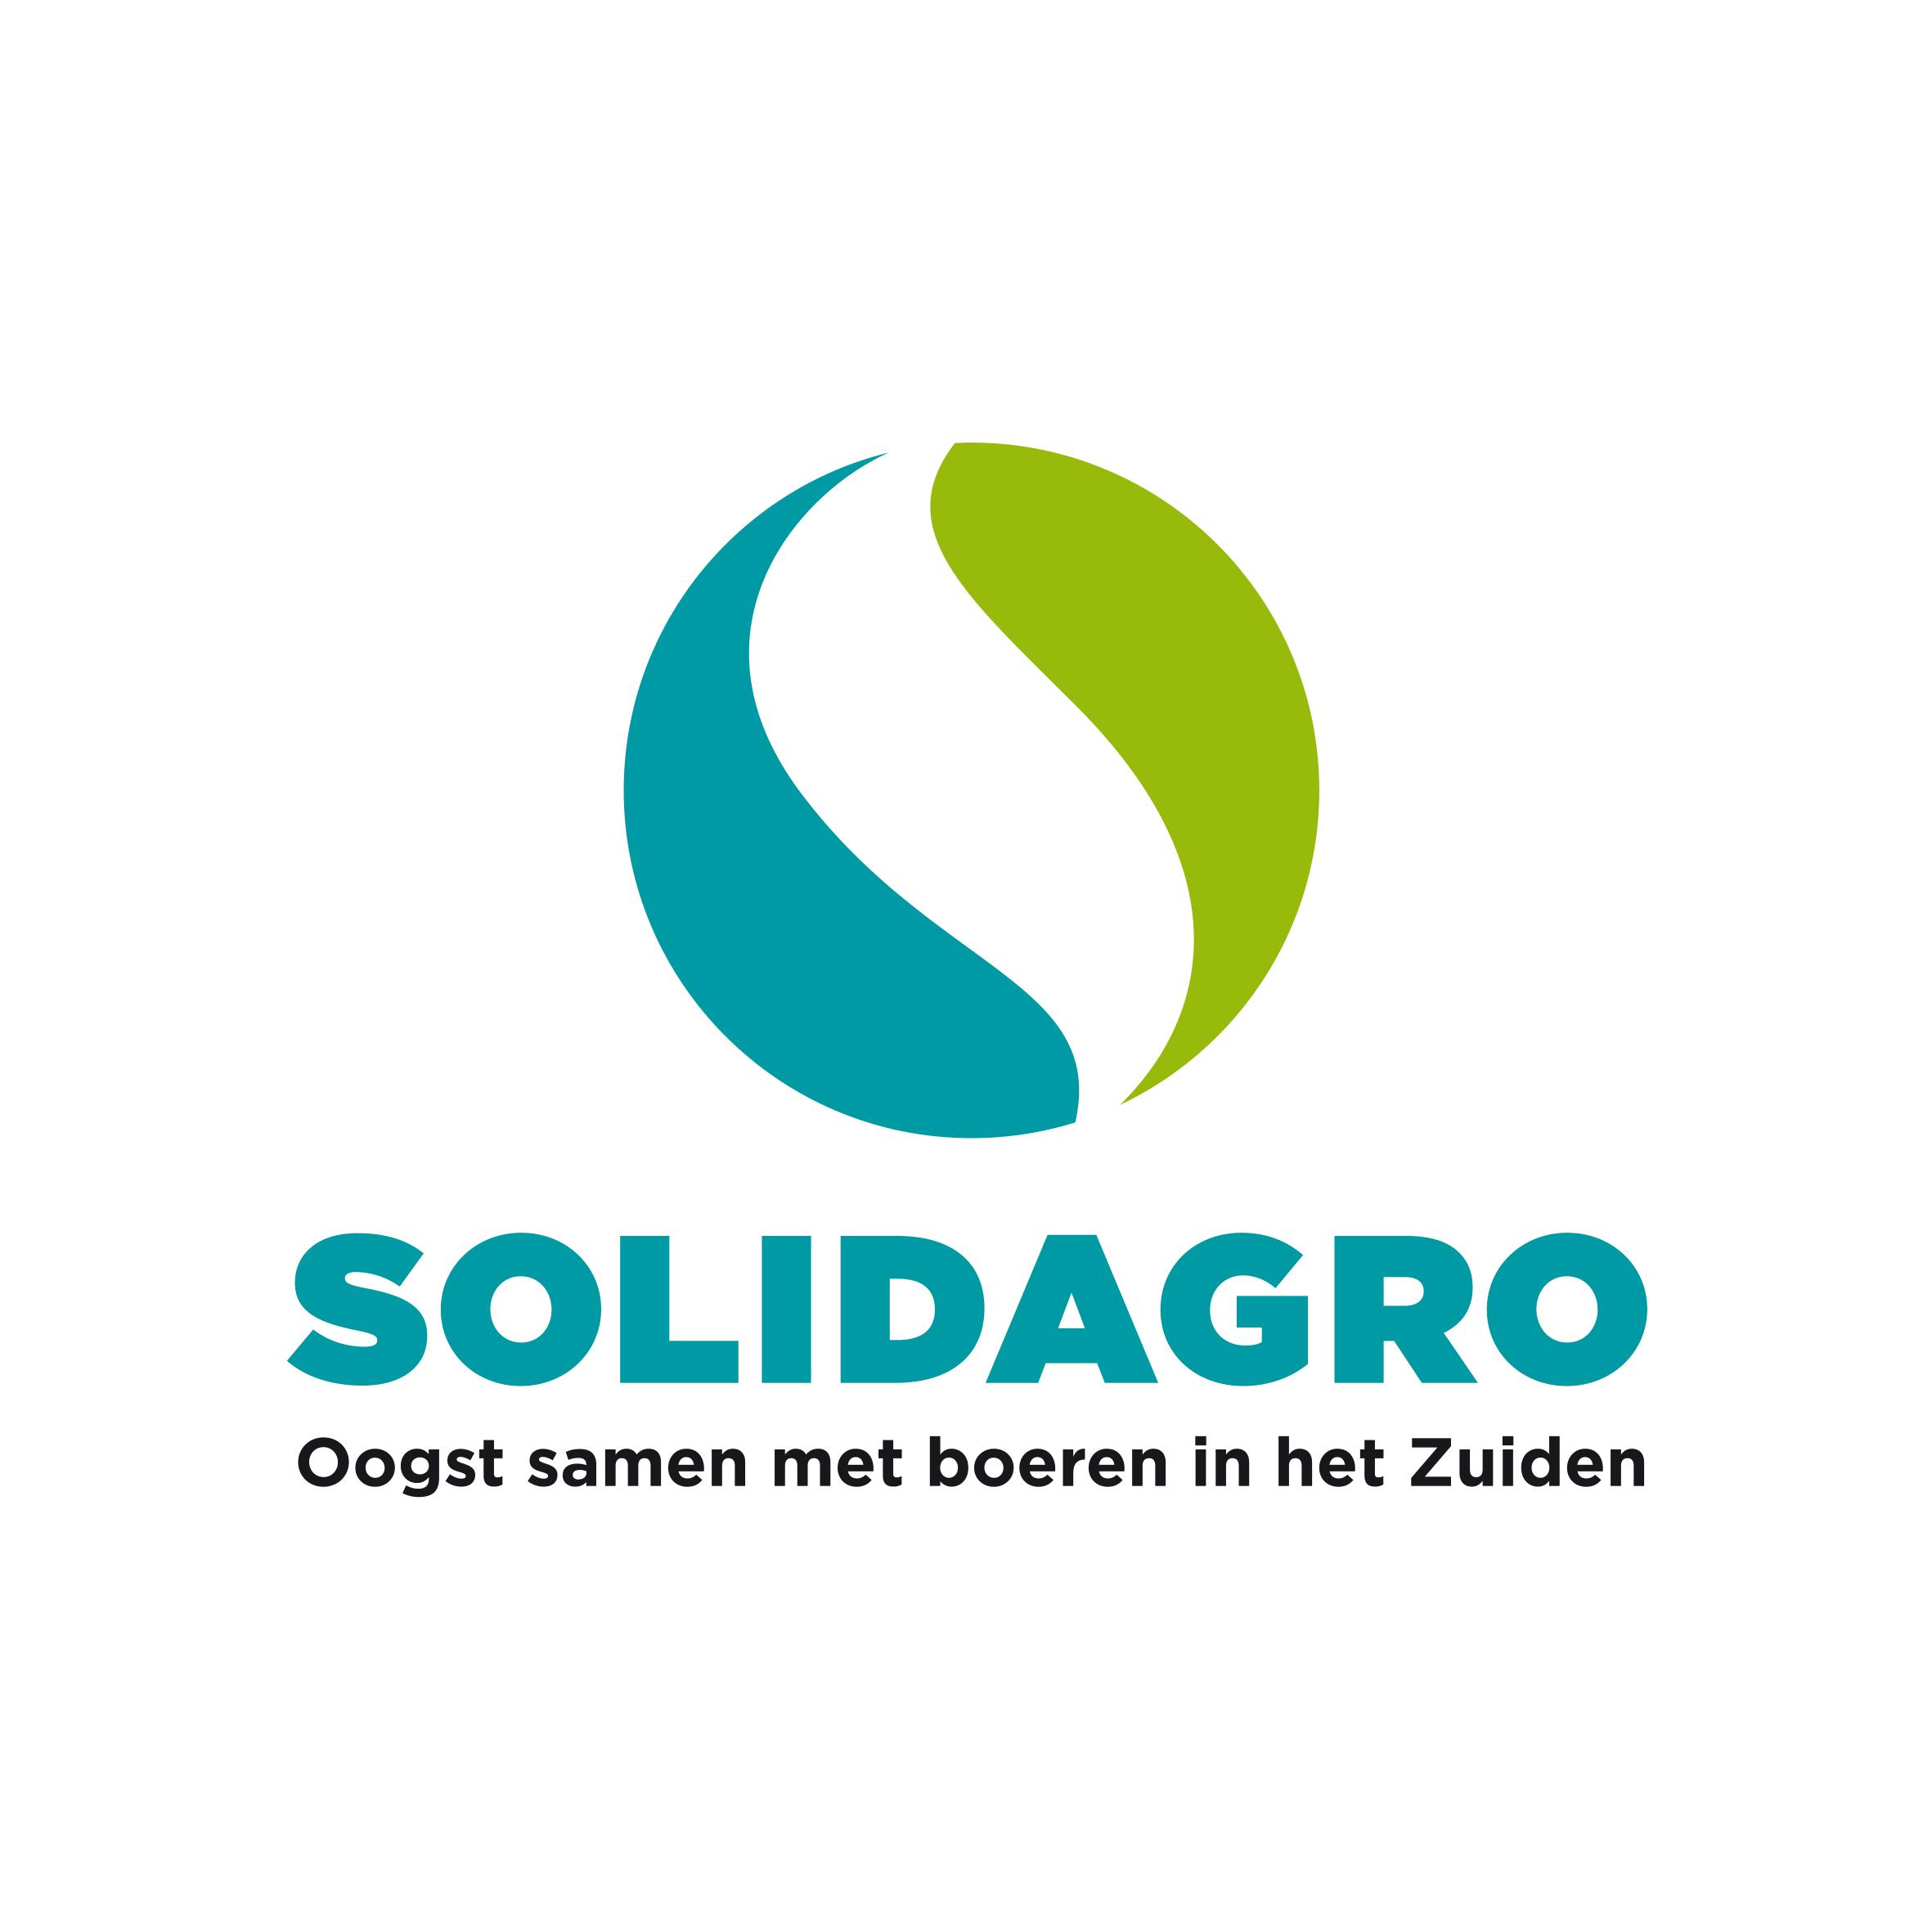 Solidagro